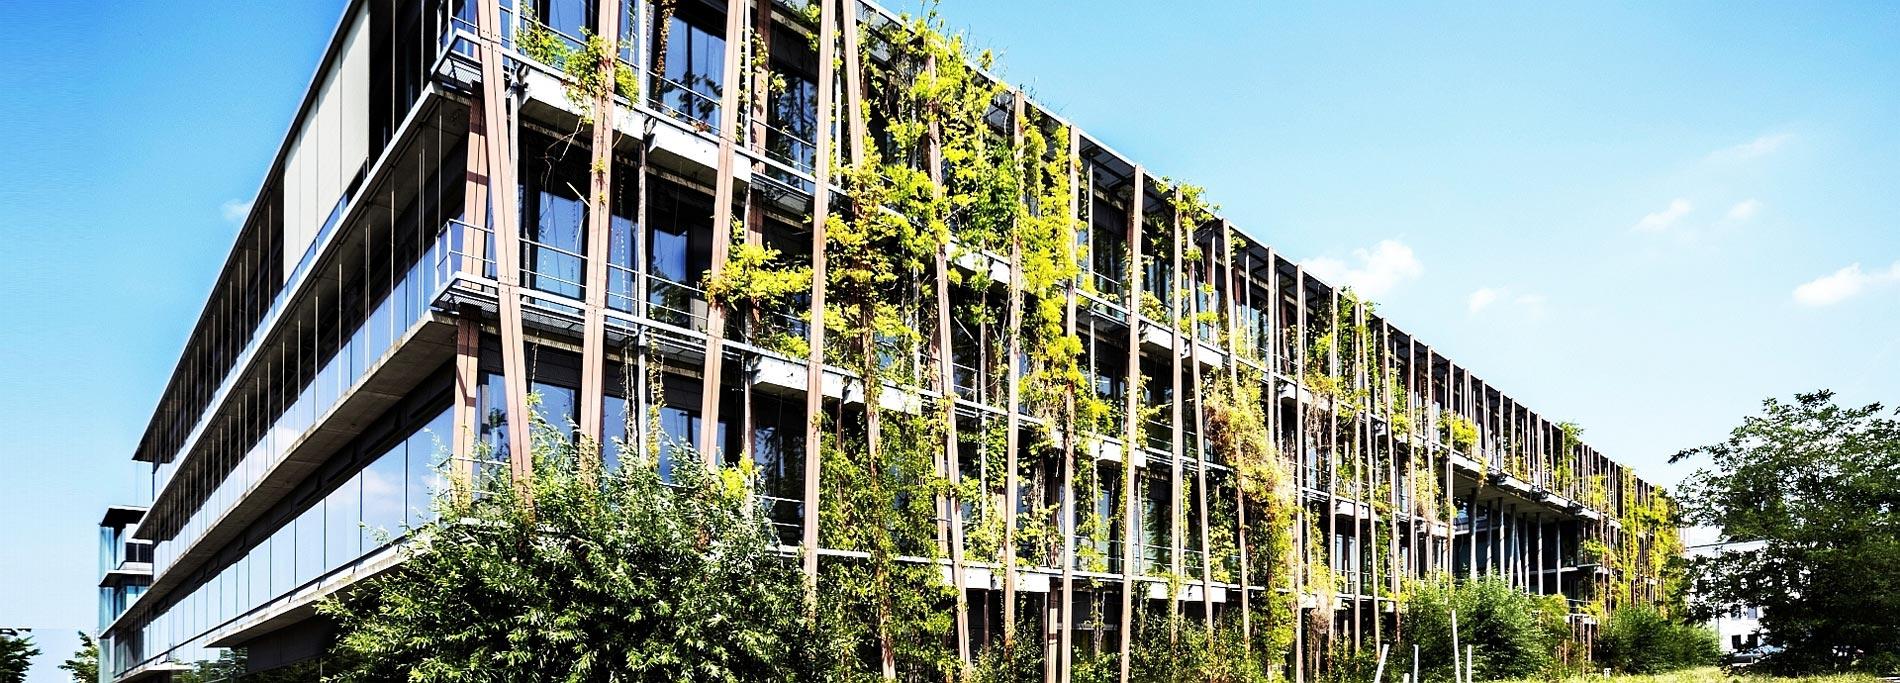 adlershof facility manage ment gmbh green building. Black Bedroom Furniture Sets. Home Design Ideas